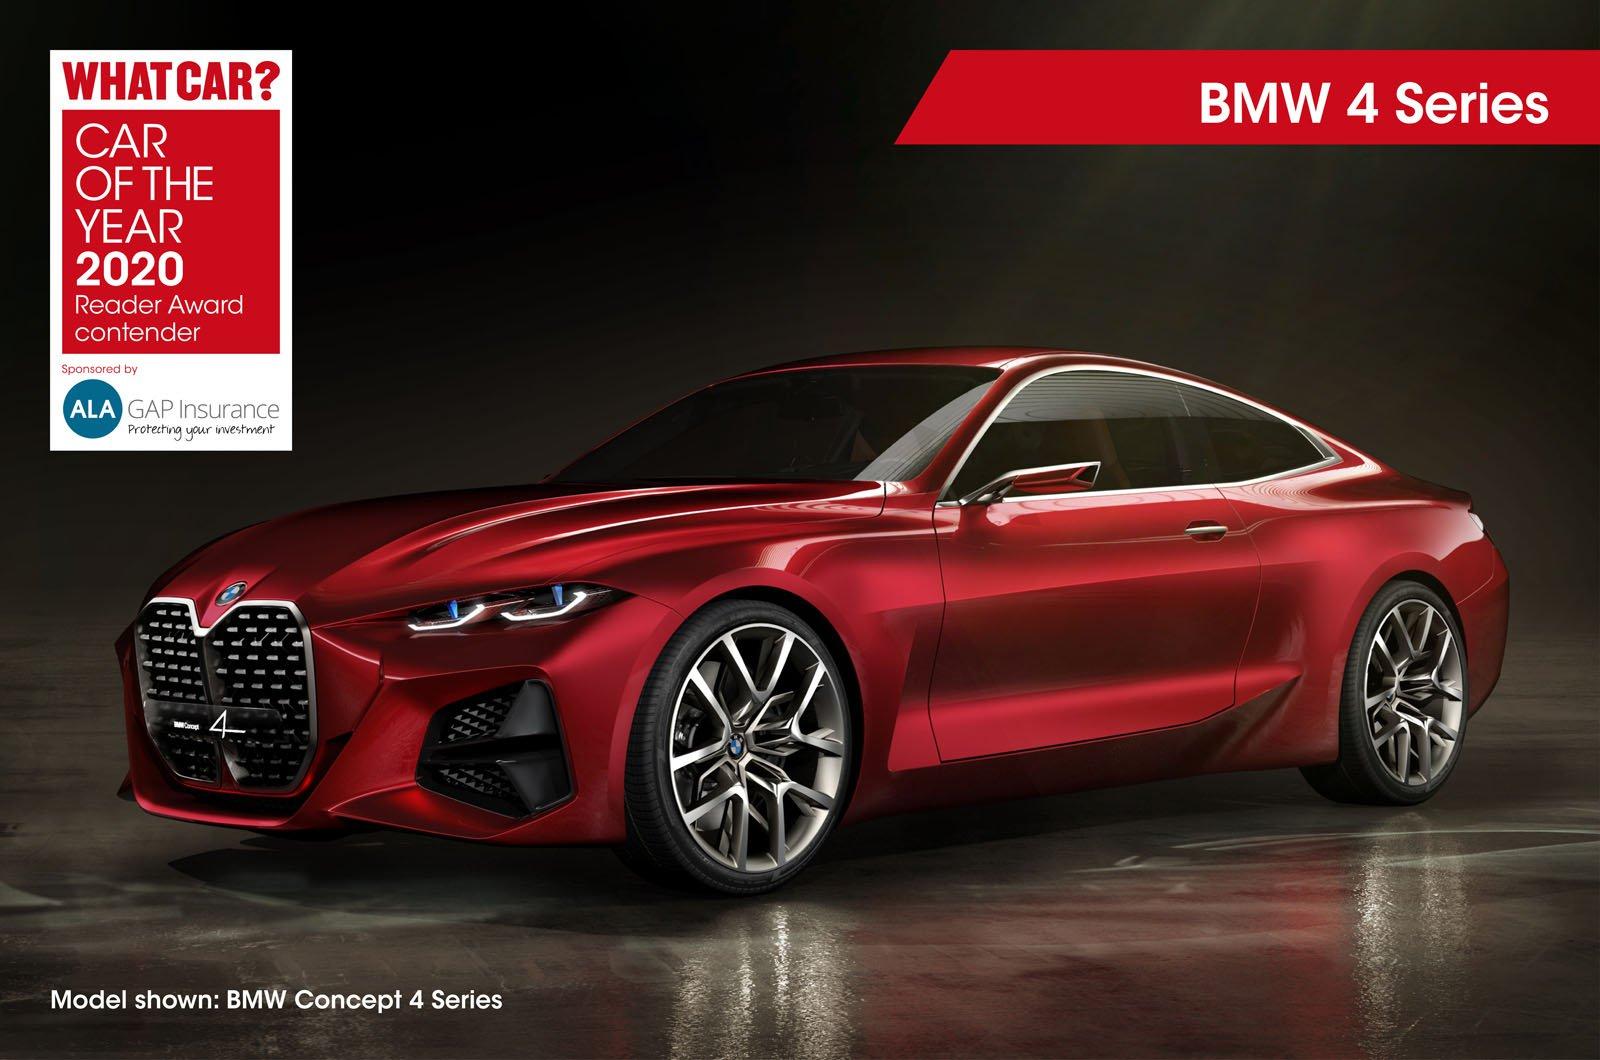 2020 COTY Reader Award contender BMW 4 Series